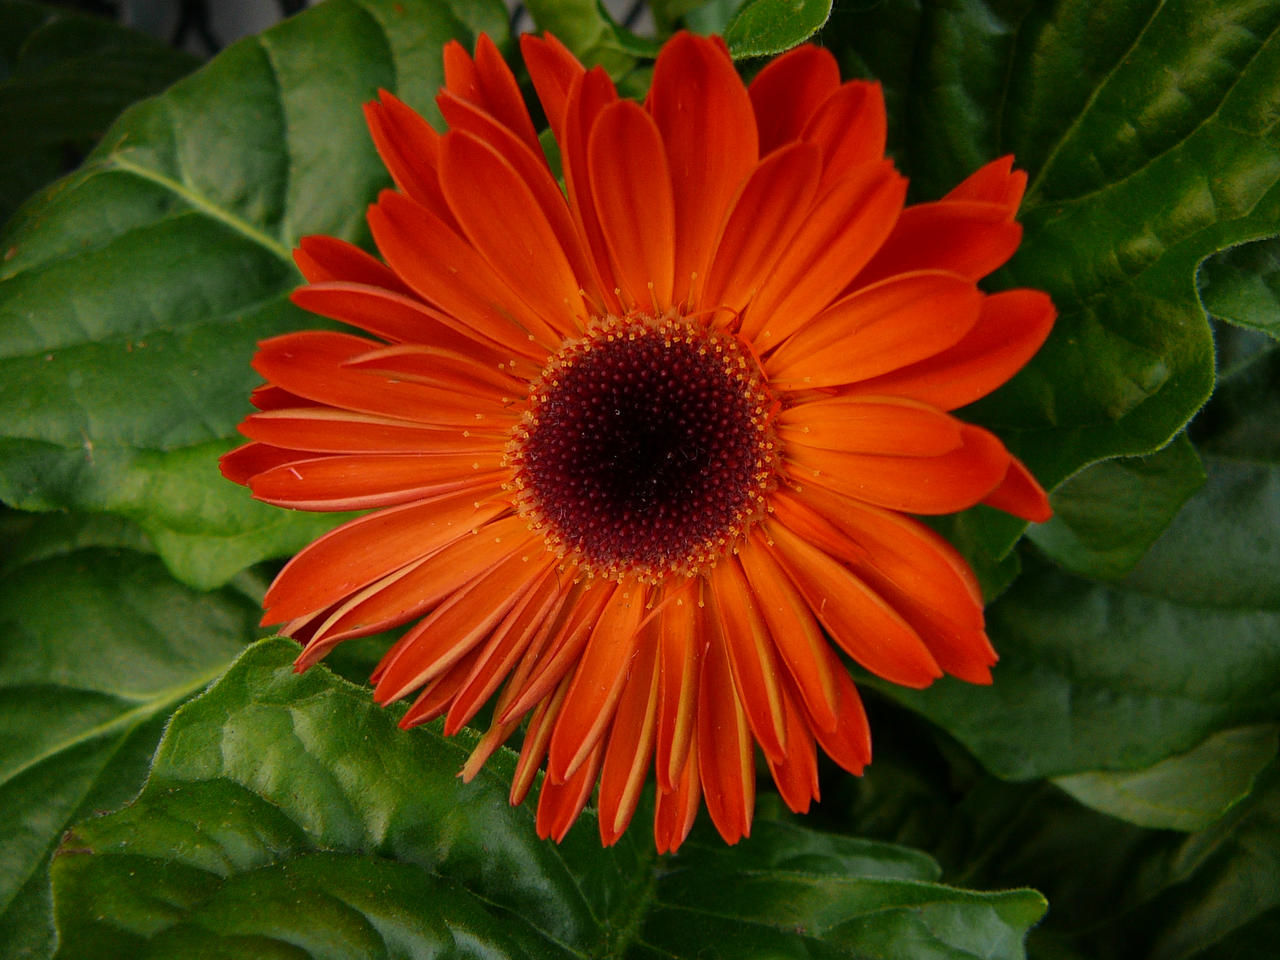 Orange Flower and Leaves Stock by Enchantedgal Stock on DeviantArt